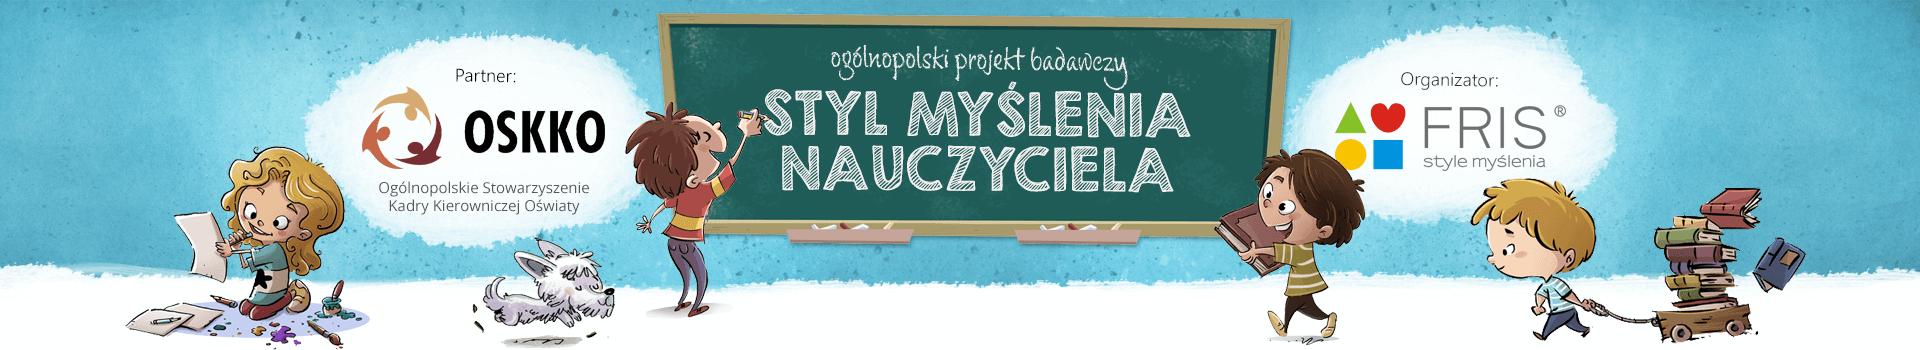 styl-myslenia-nauczyciela-FRIS-header-home